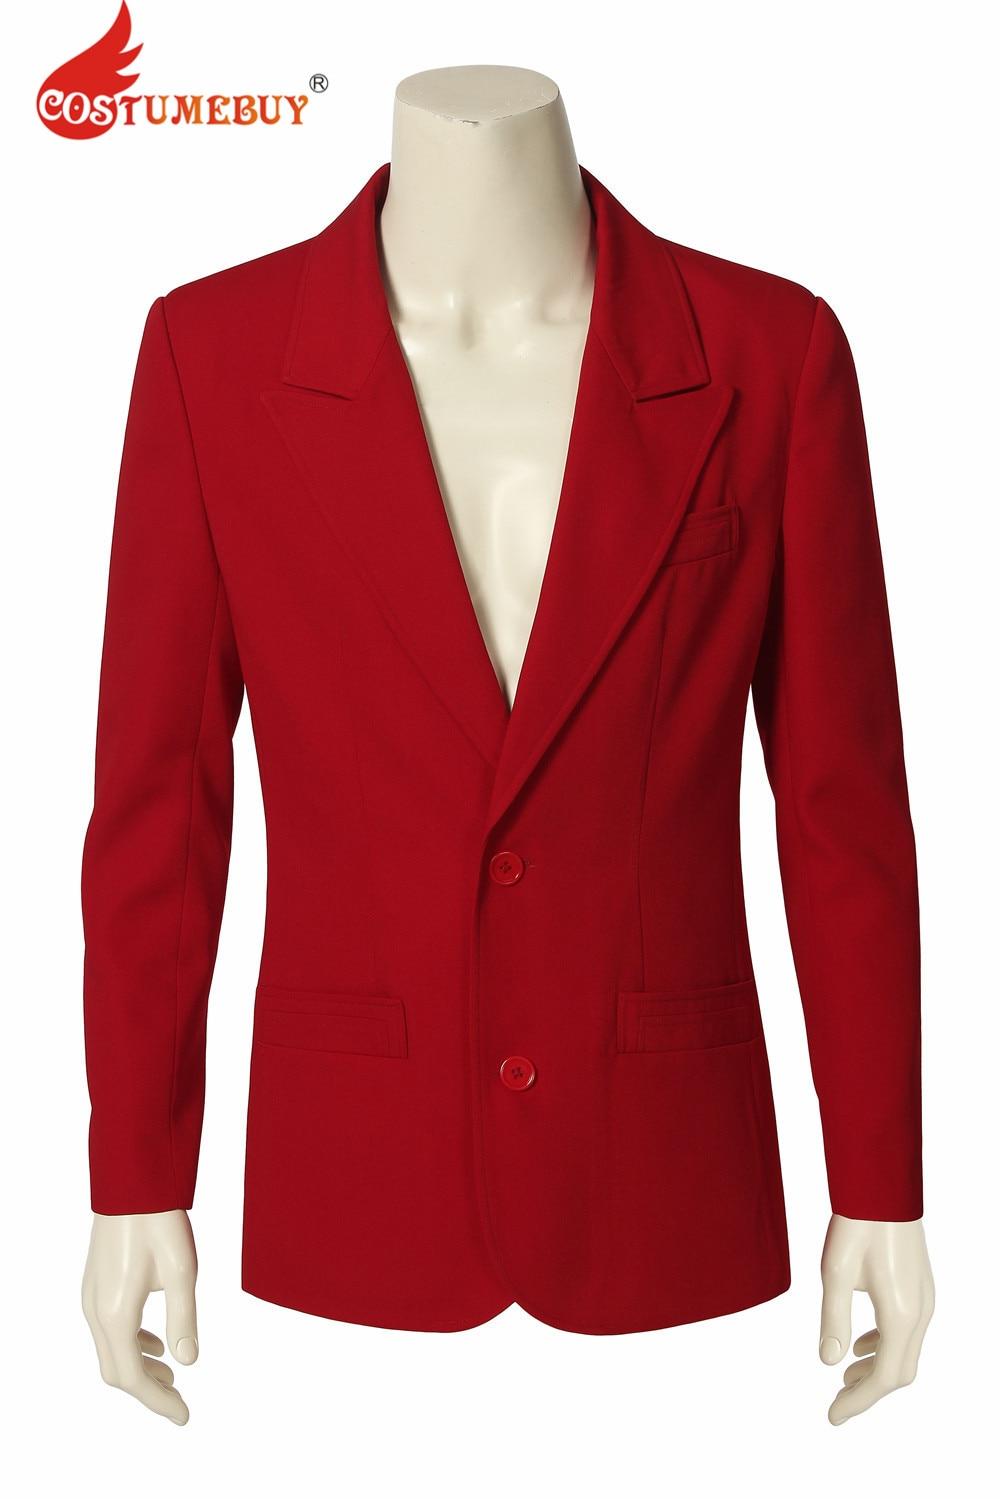 CostumeBuy Joker Origin Movie Romeo Cosplay Joaquin Phoenix Arthur Fleck Costume Jacket Red Coat Uniform Men Halloween Outfit